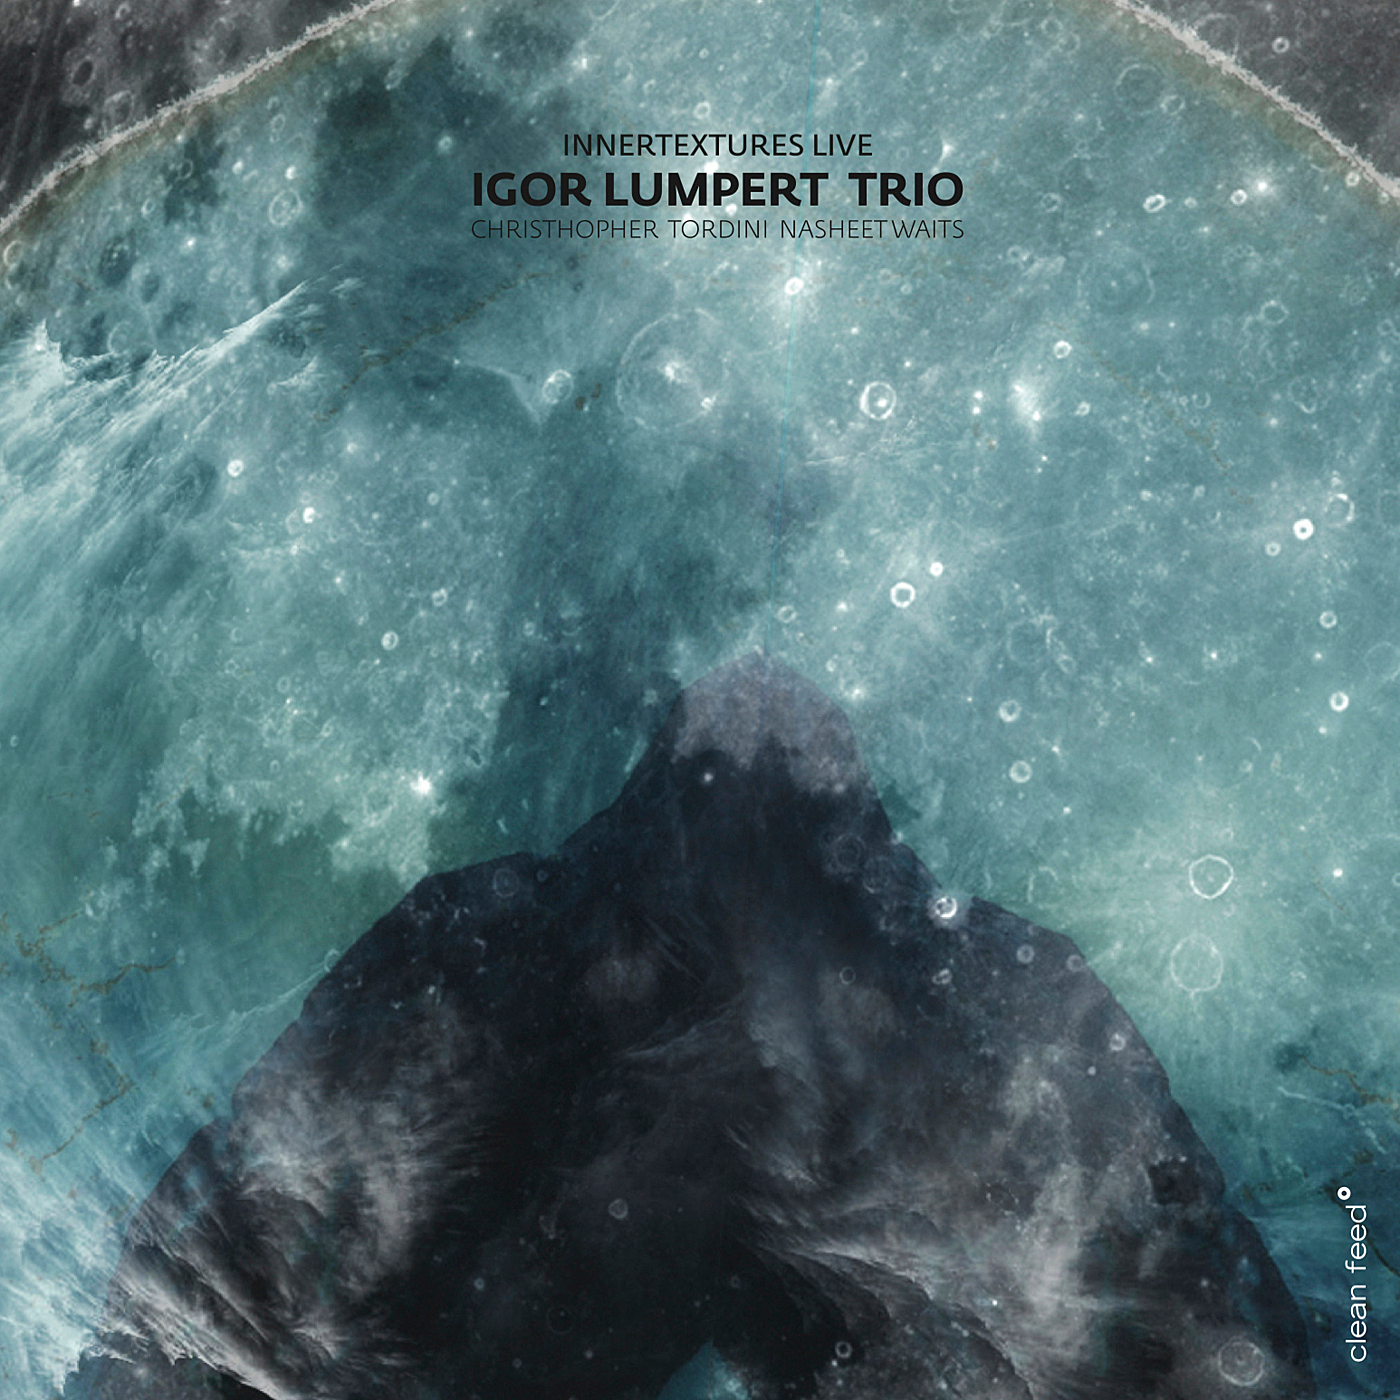 innertextures live igor lumpert trio